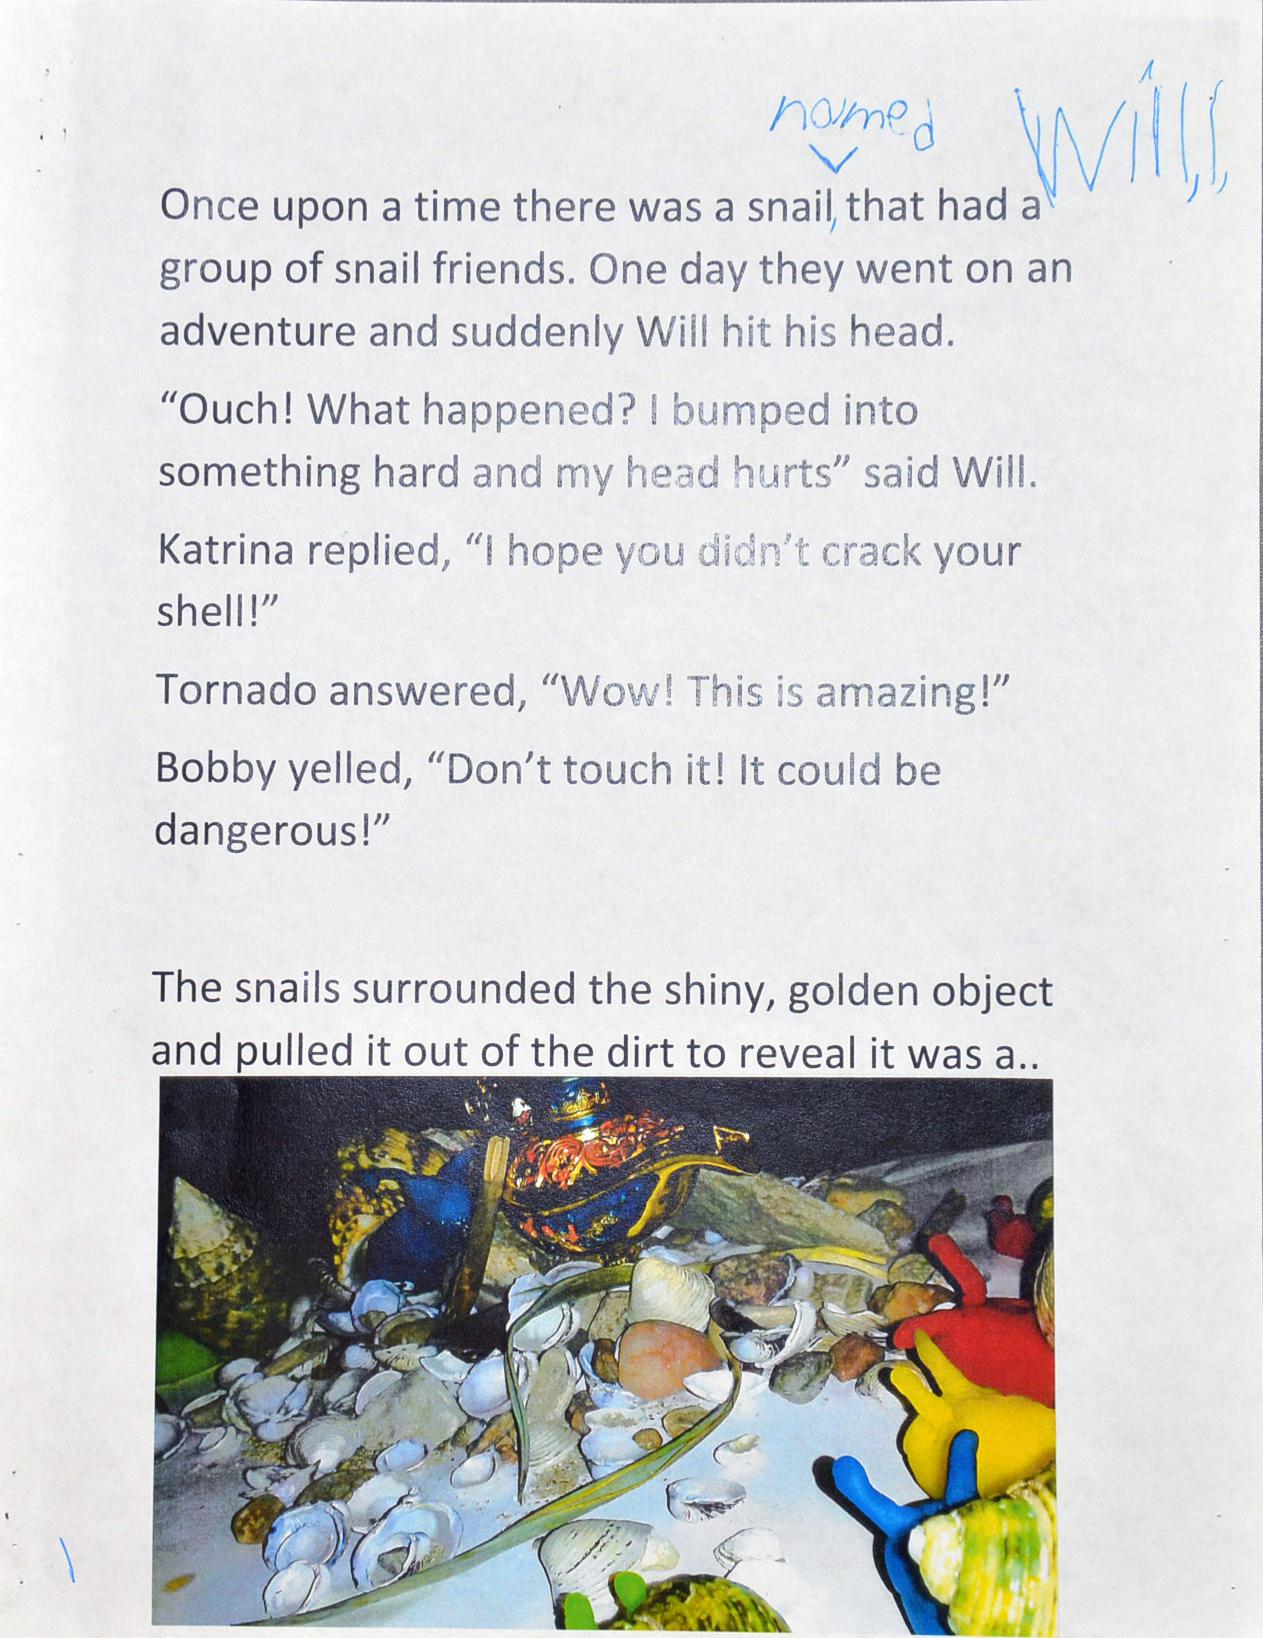 AETN - I Wish (A Snail's Tale)